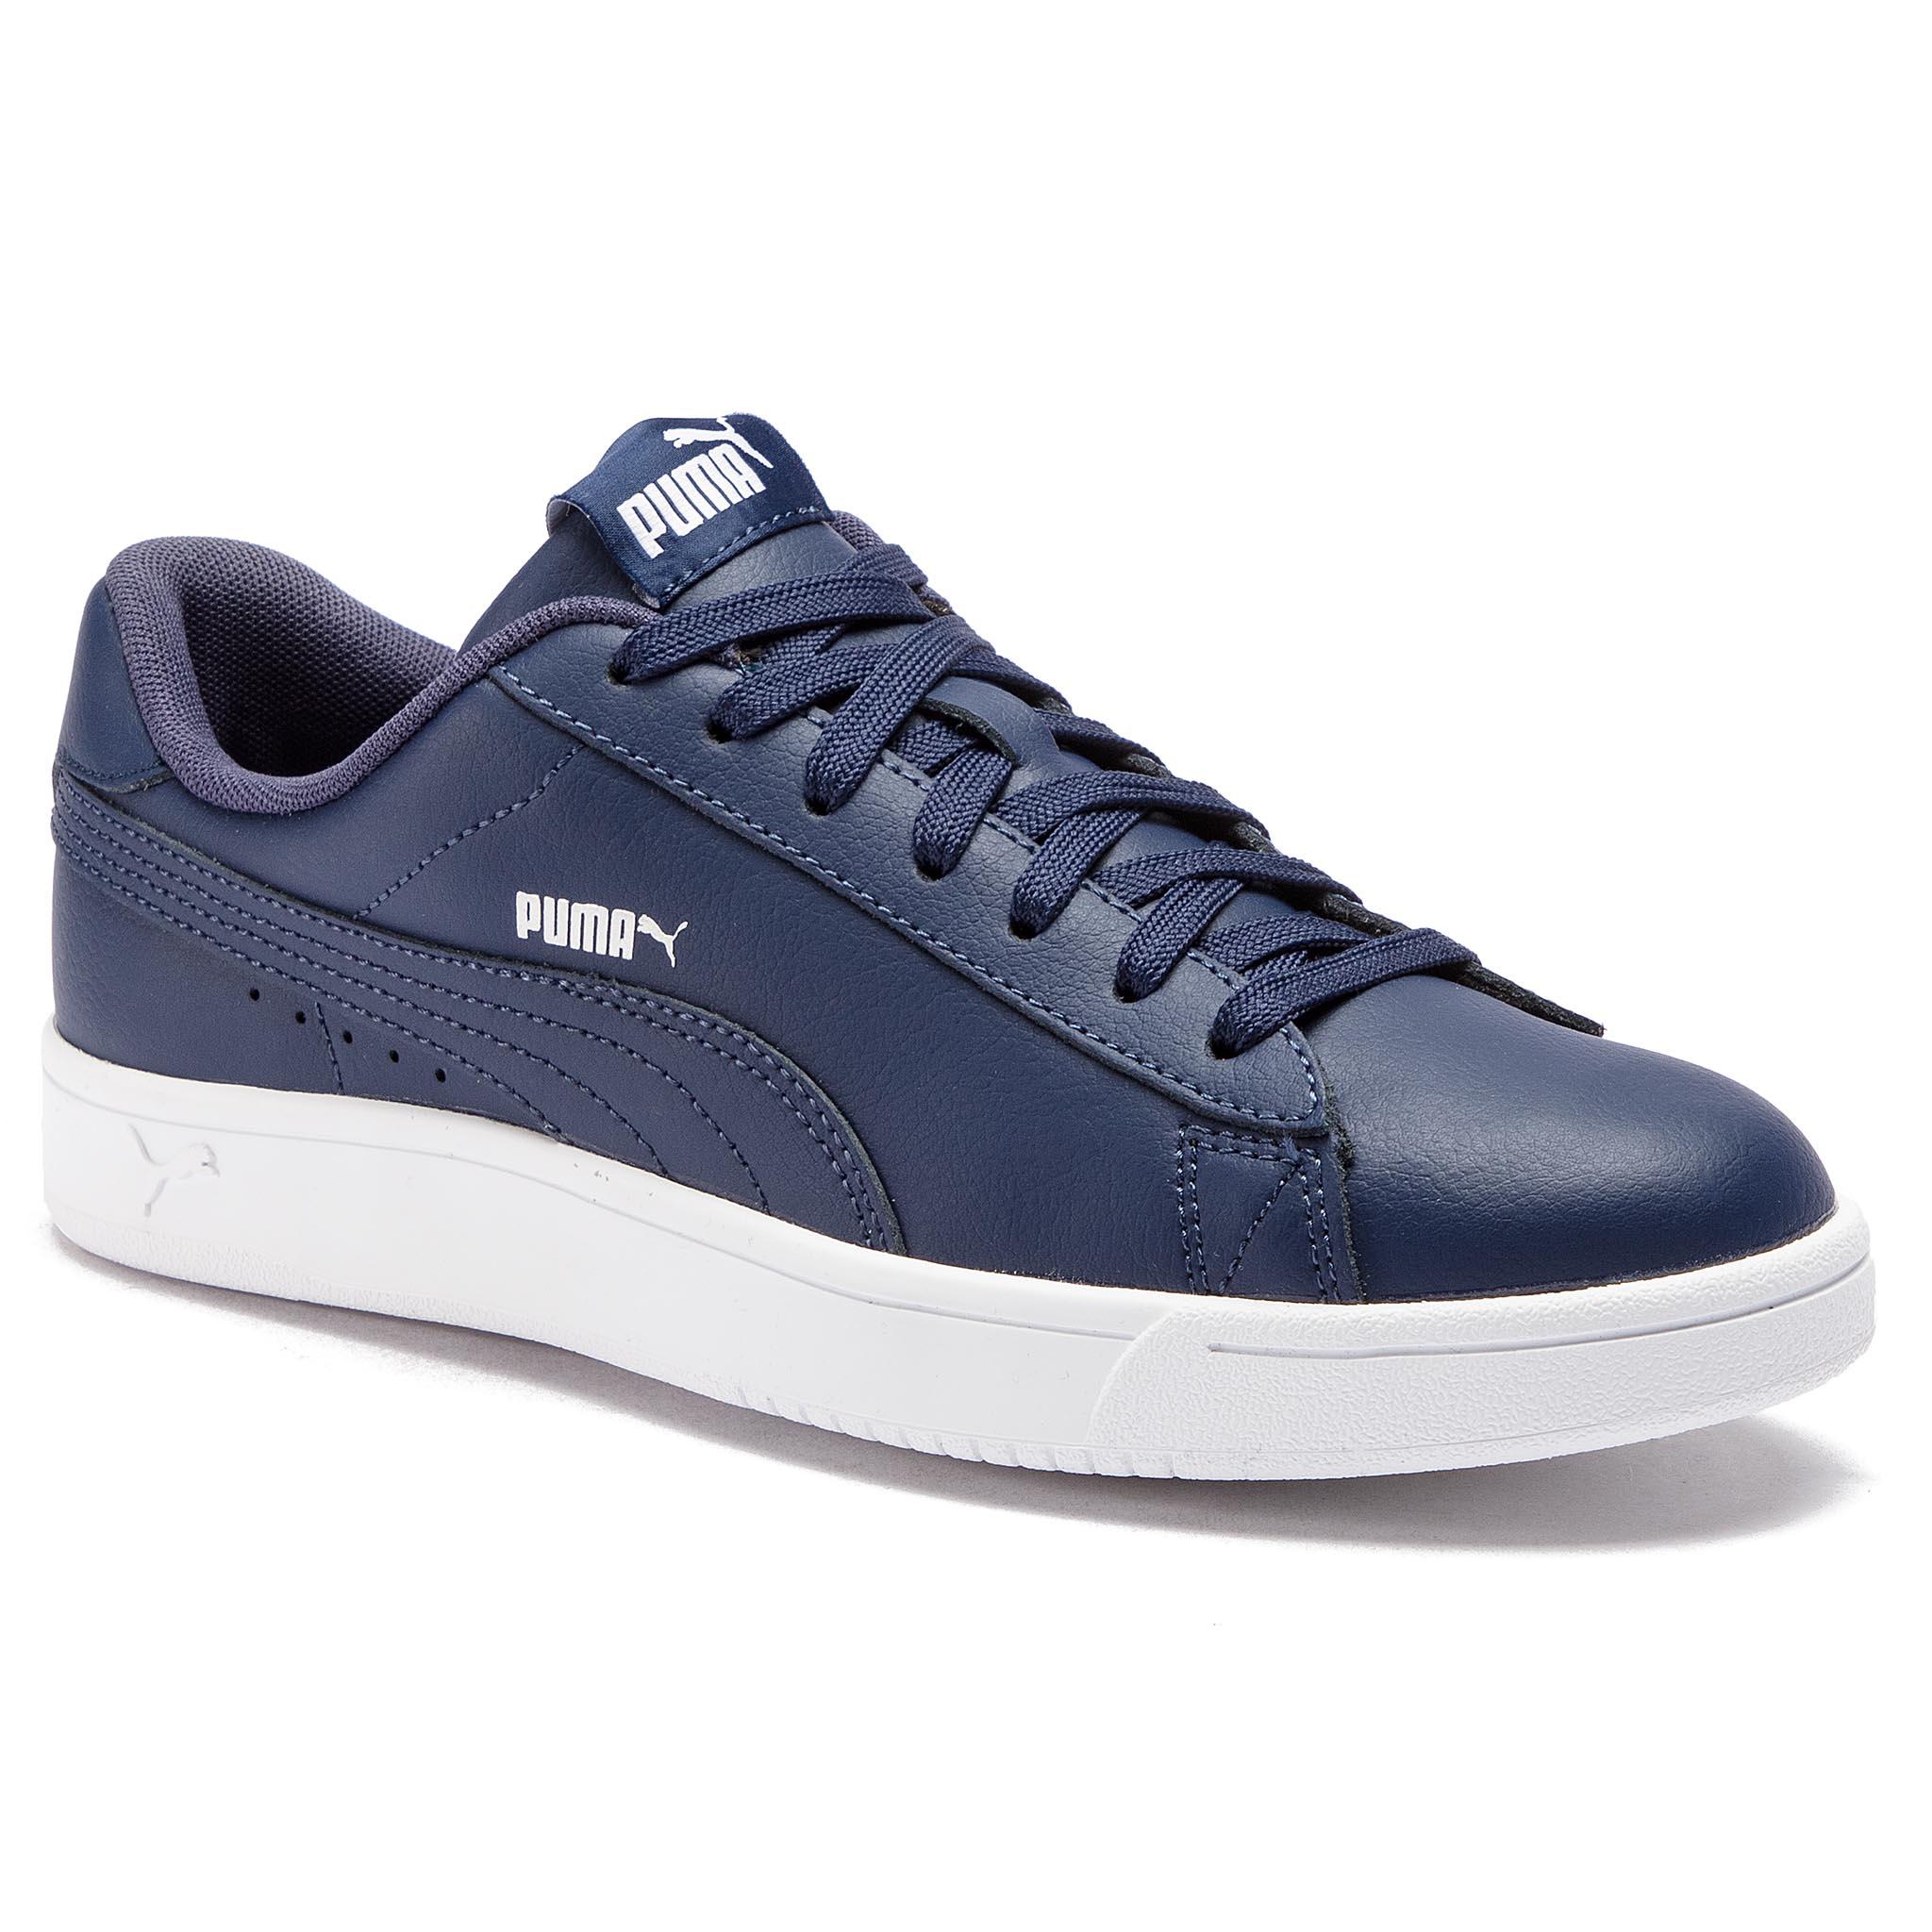 4b5360225 Sneakers PUMA Court Breaker Derby L 369503 03 Peacoat Silver Puma White